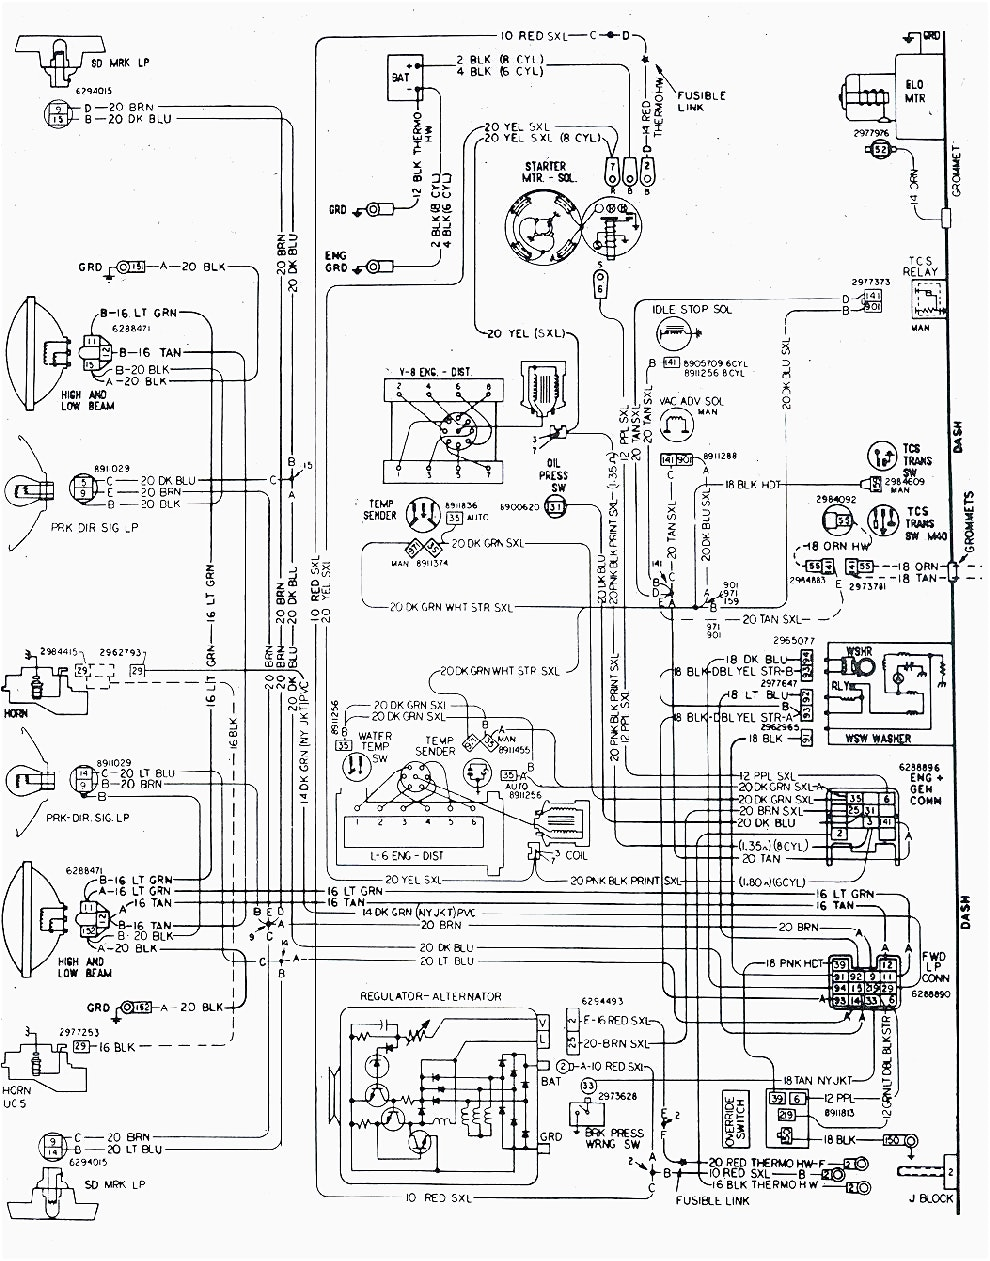 camaro z28 wiring harness